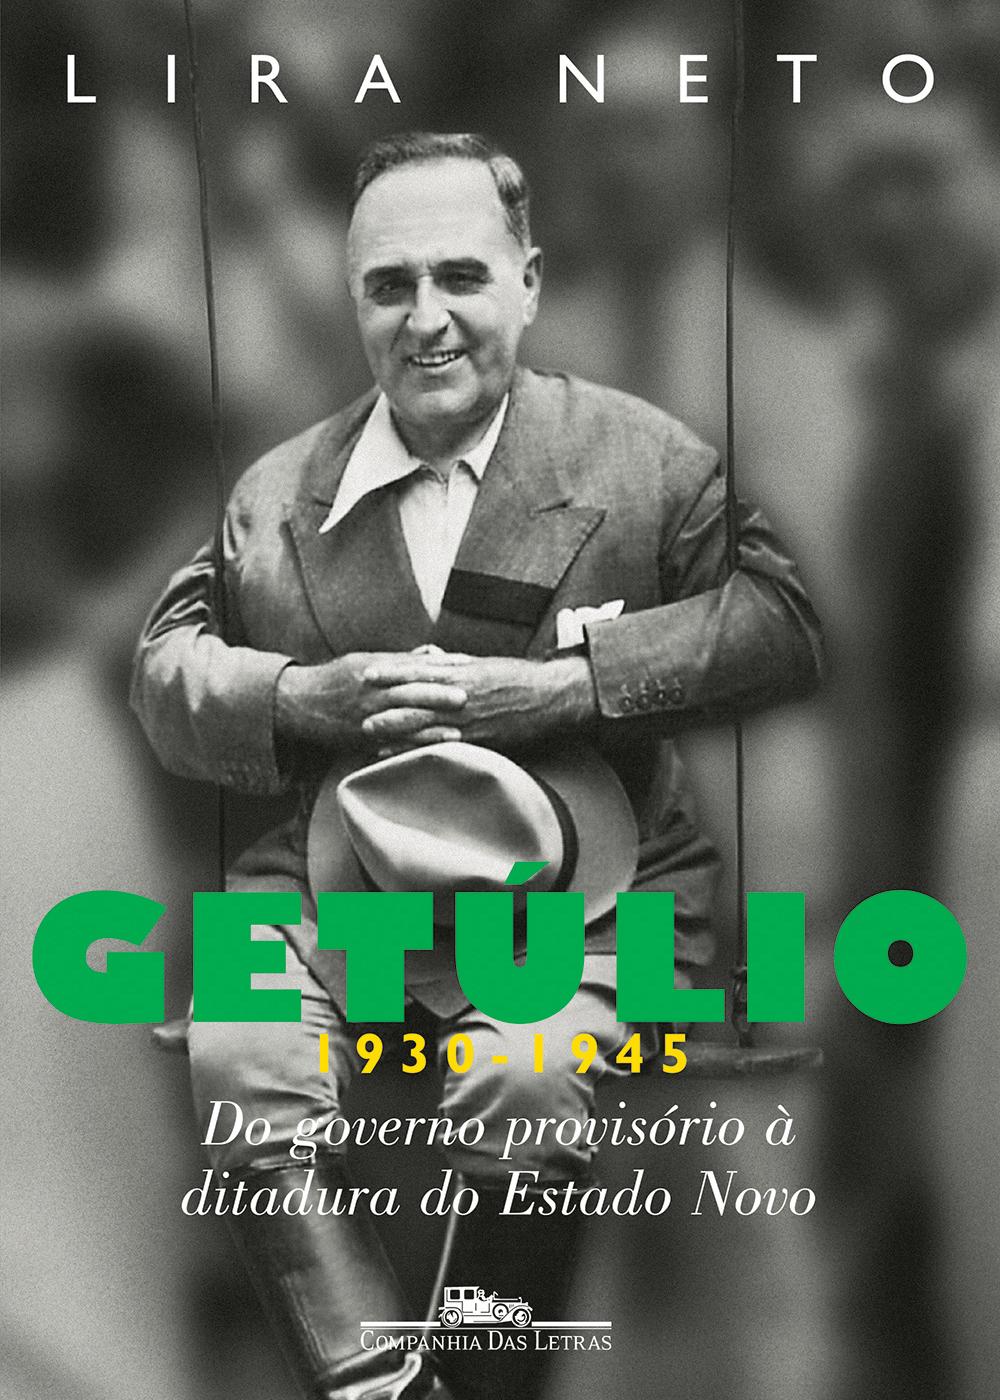 Neto, Lira - Getúlio (1930-1945).jpg